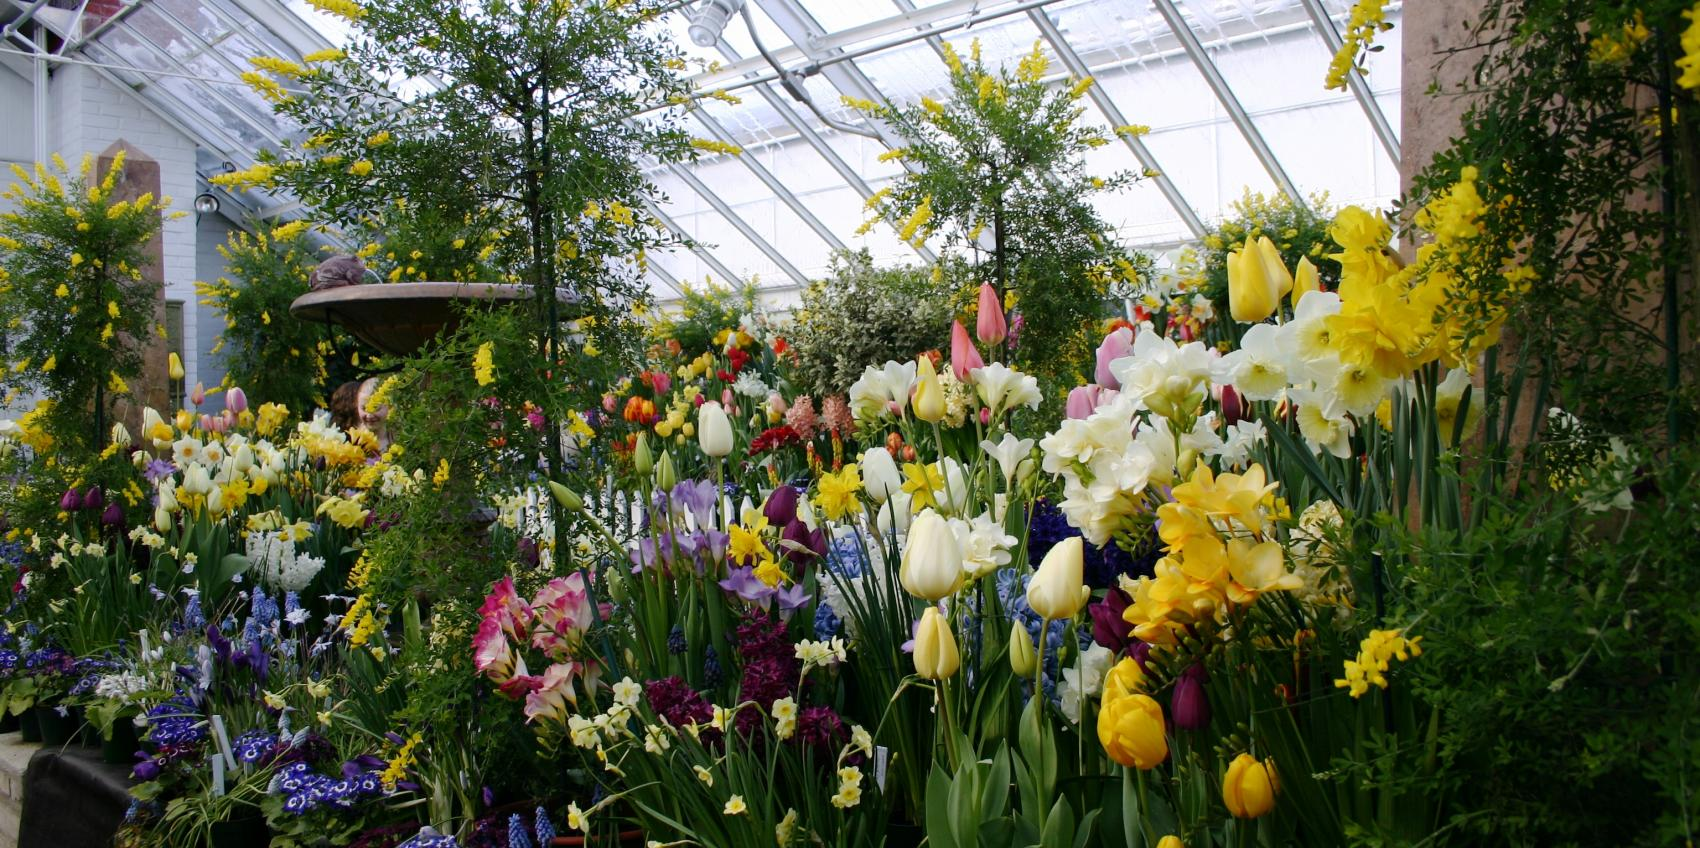 Smith College Bulb Show 2020.Botanic Garden Of Smith College American Public Gardens